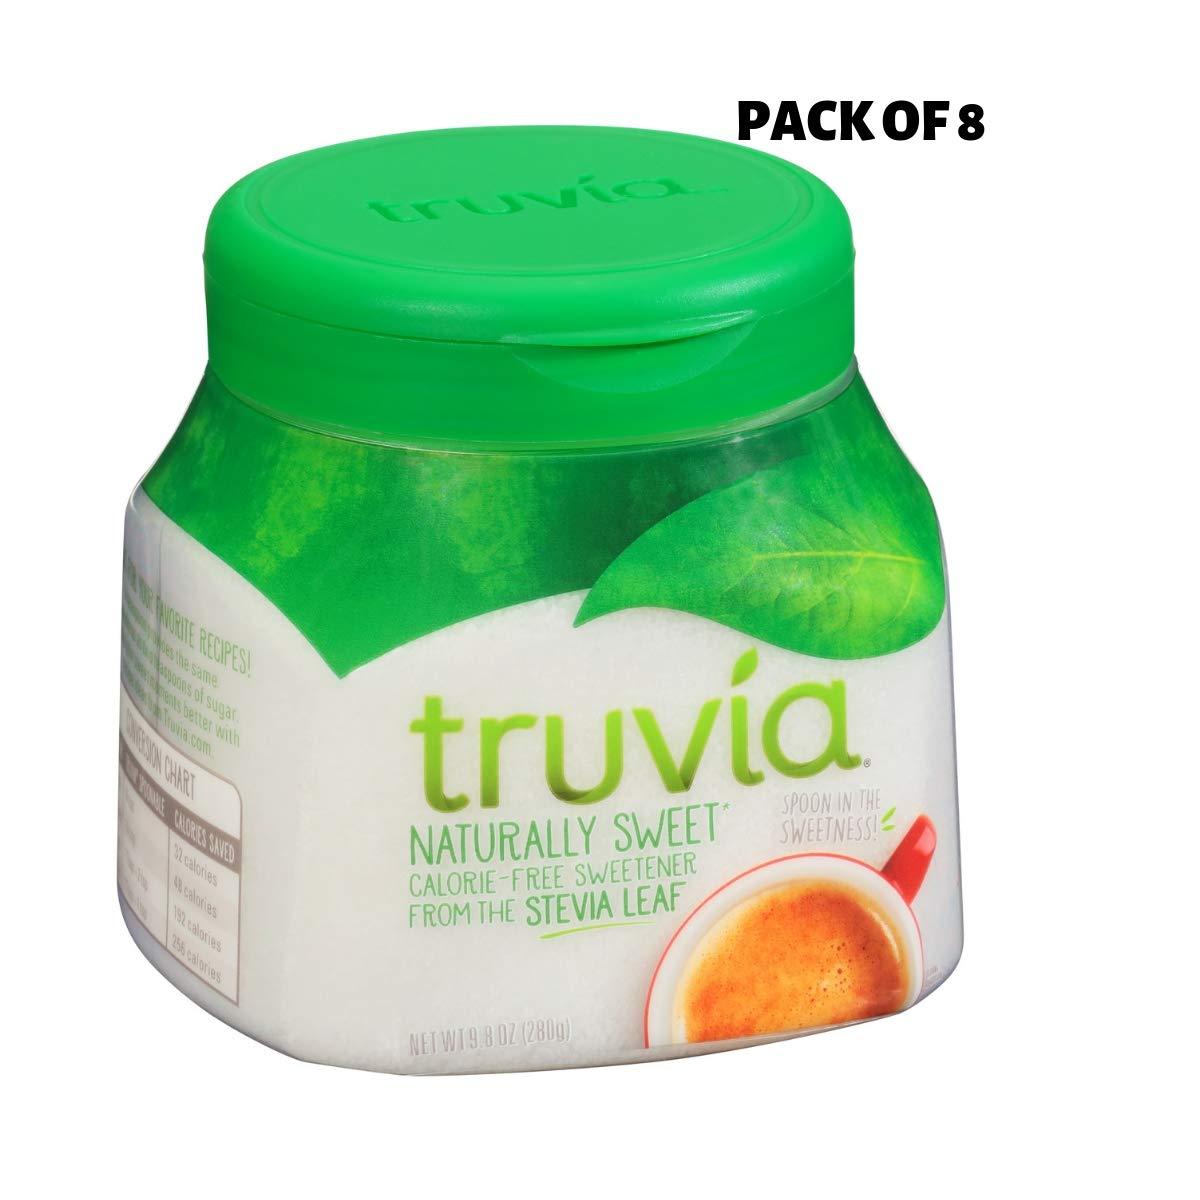 Truvia Calorie Free Sweetener, 9.8 oz jar (Pack of 4) (2 Sizes: 8 Pack)